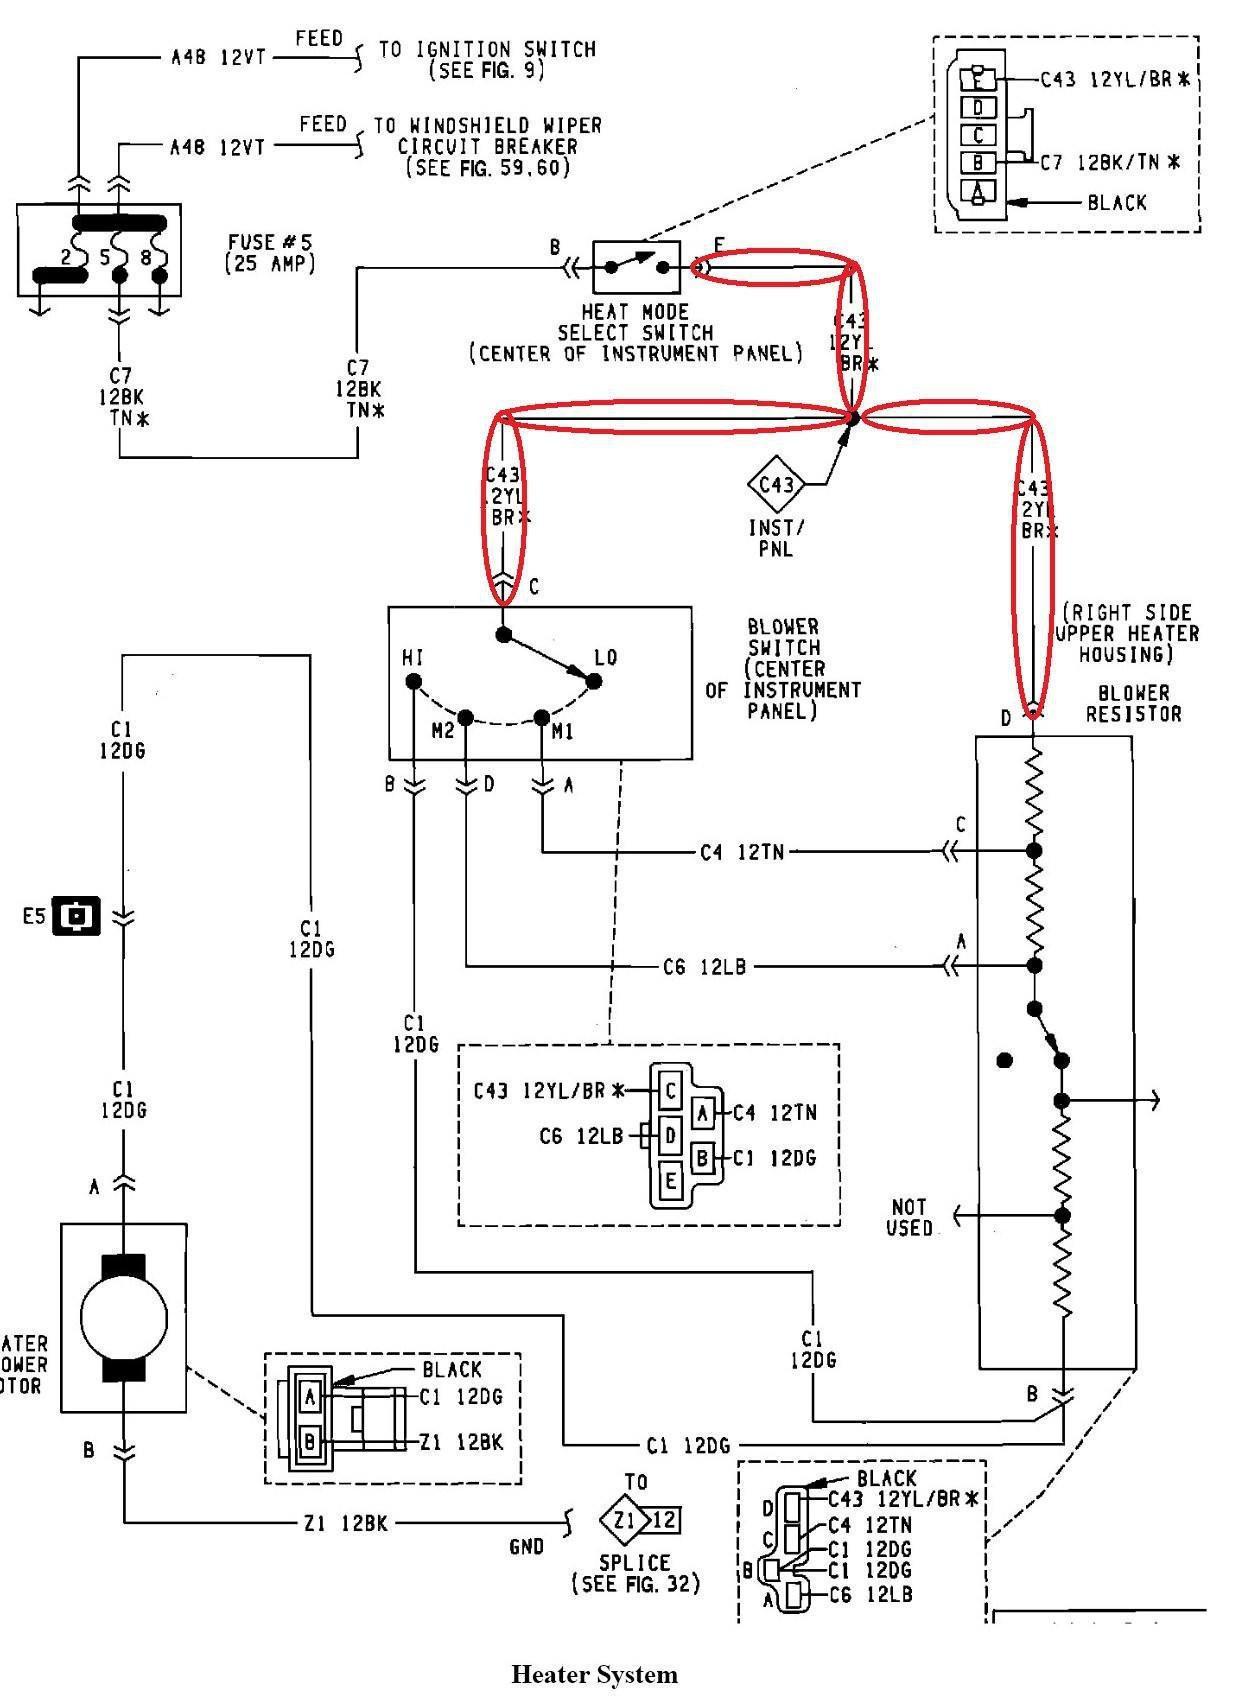 Golf Cart Voltage Reducer Wiring Diagram Rate 12 Volt Golf Cart - Golf Cart Voltage Reducer Wiring Diagram